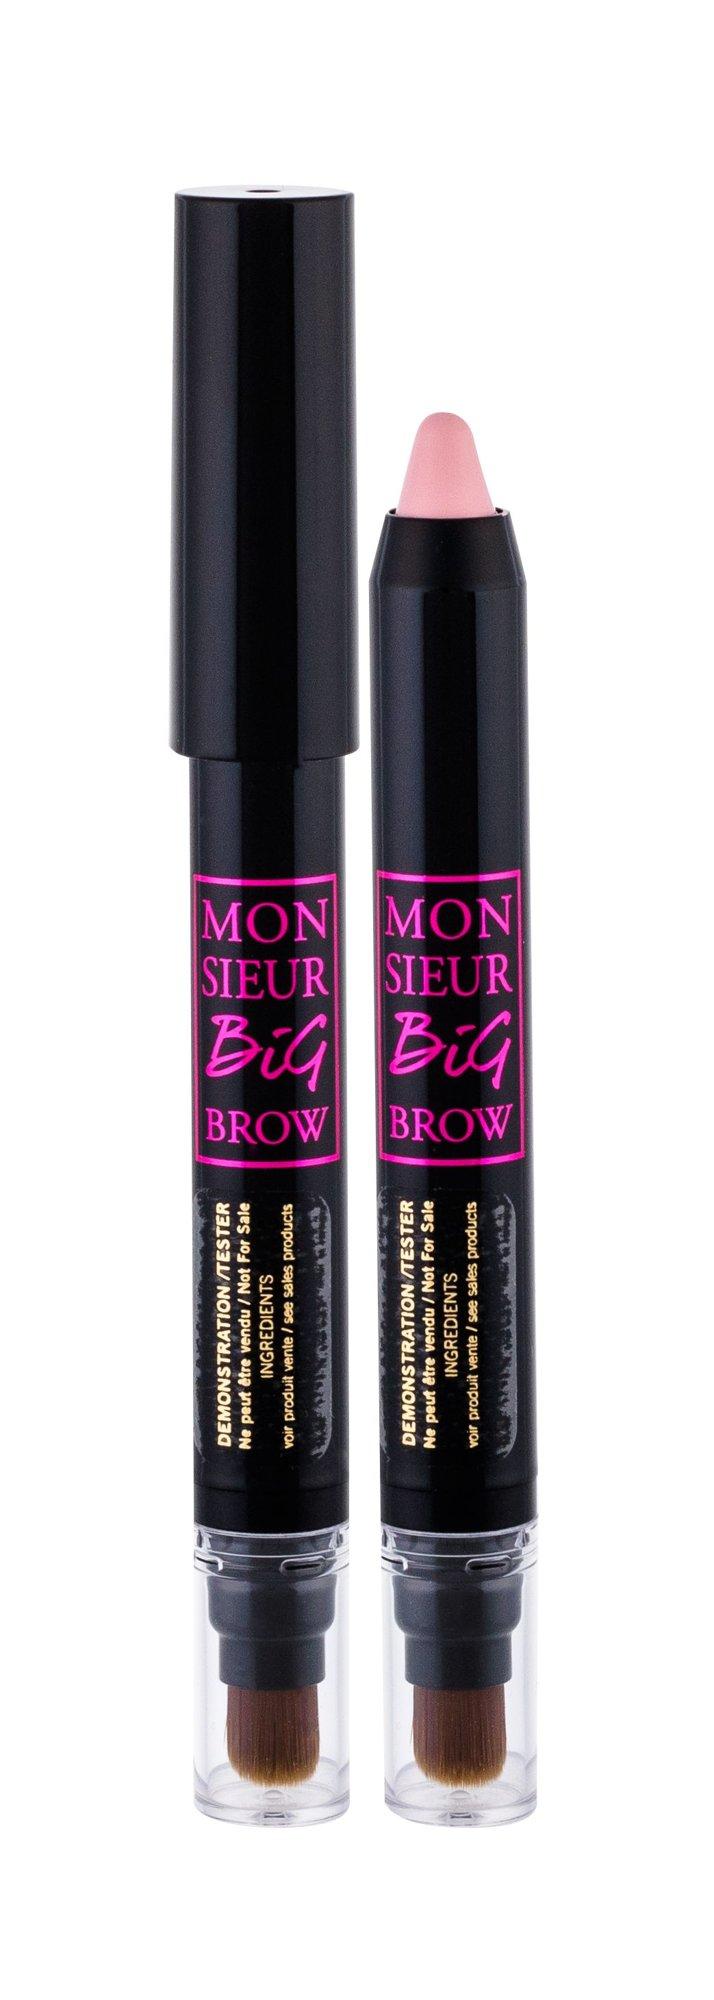 Lancôme Monsieur Big Eyebrow Pencil 1,5ml 00 Highlighter Brow